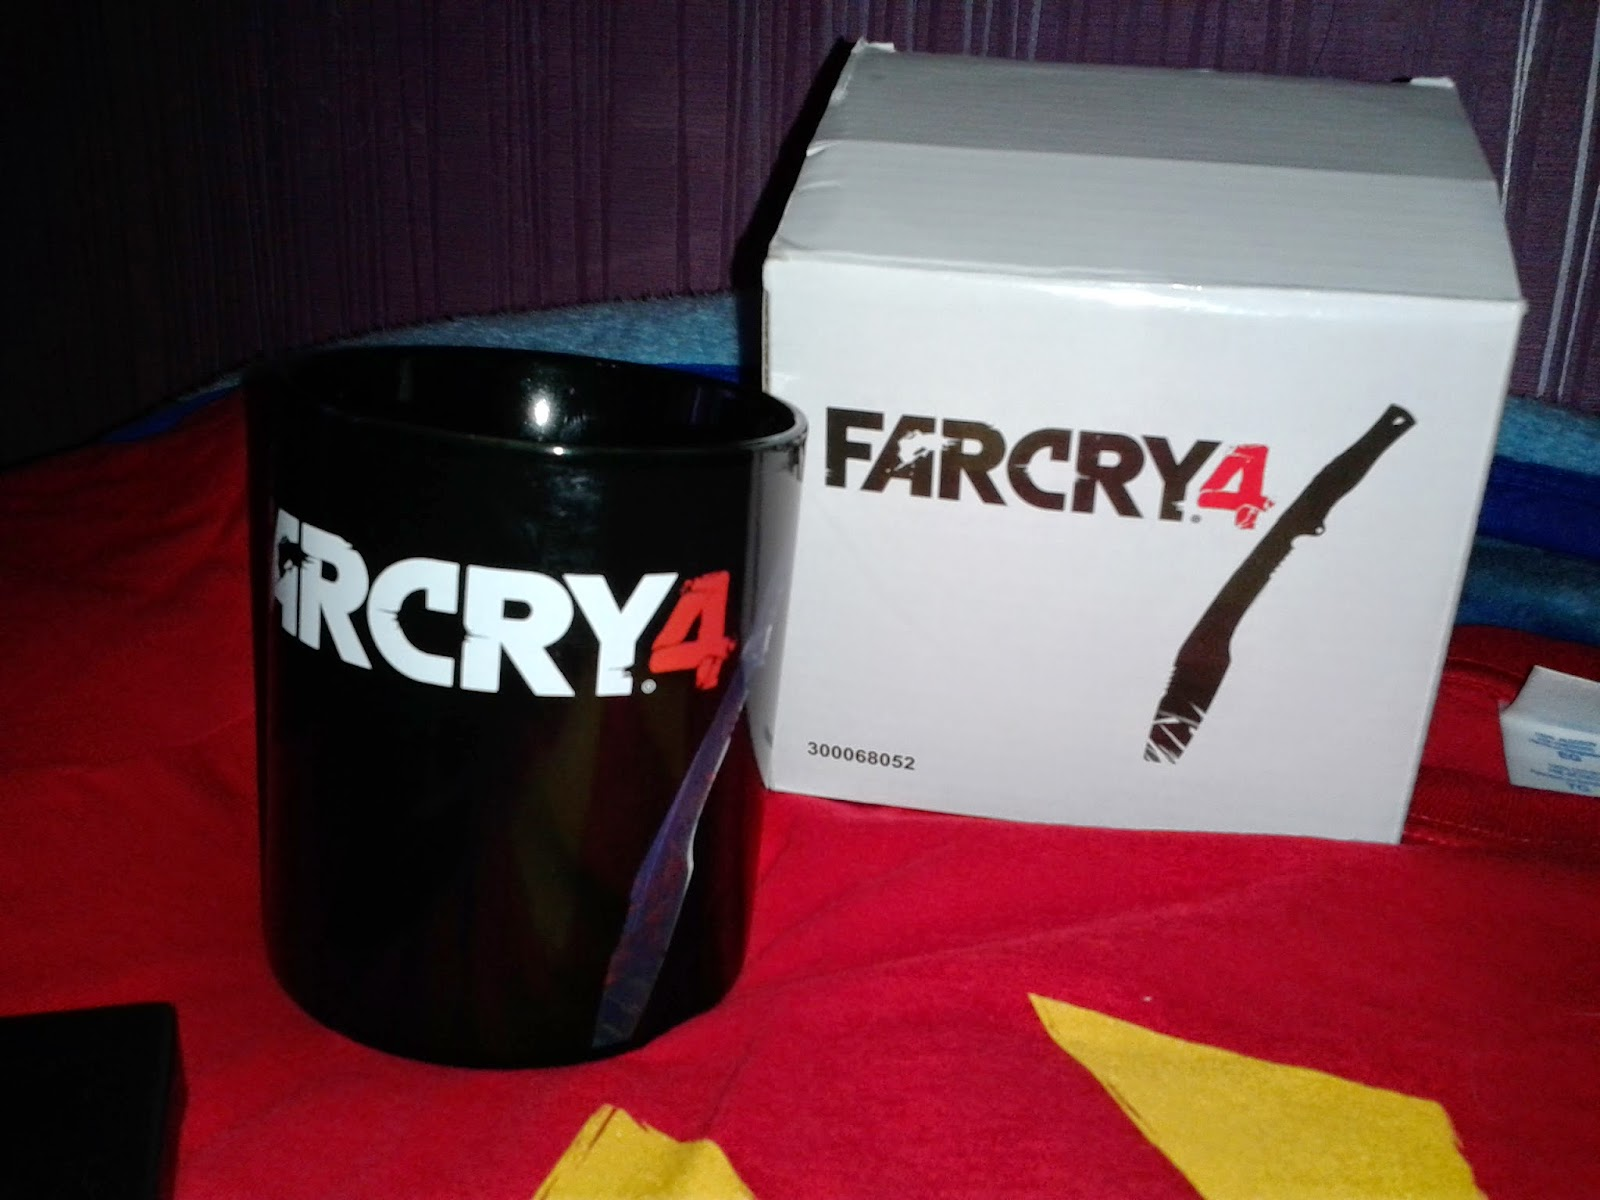 Paczka od gra.pl Far Cry 4